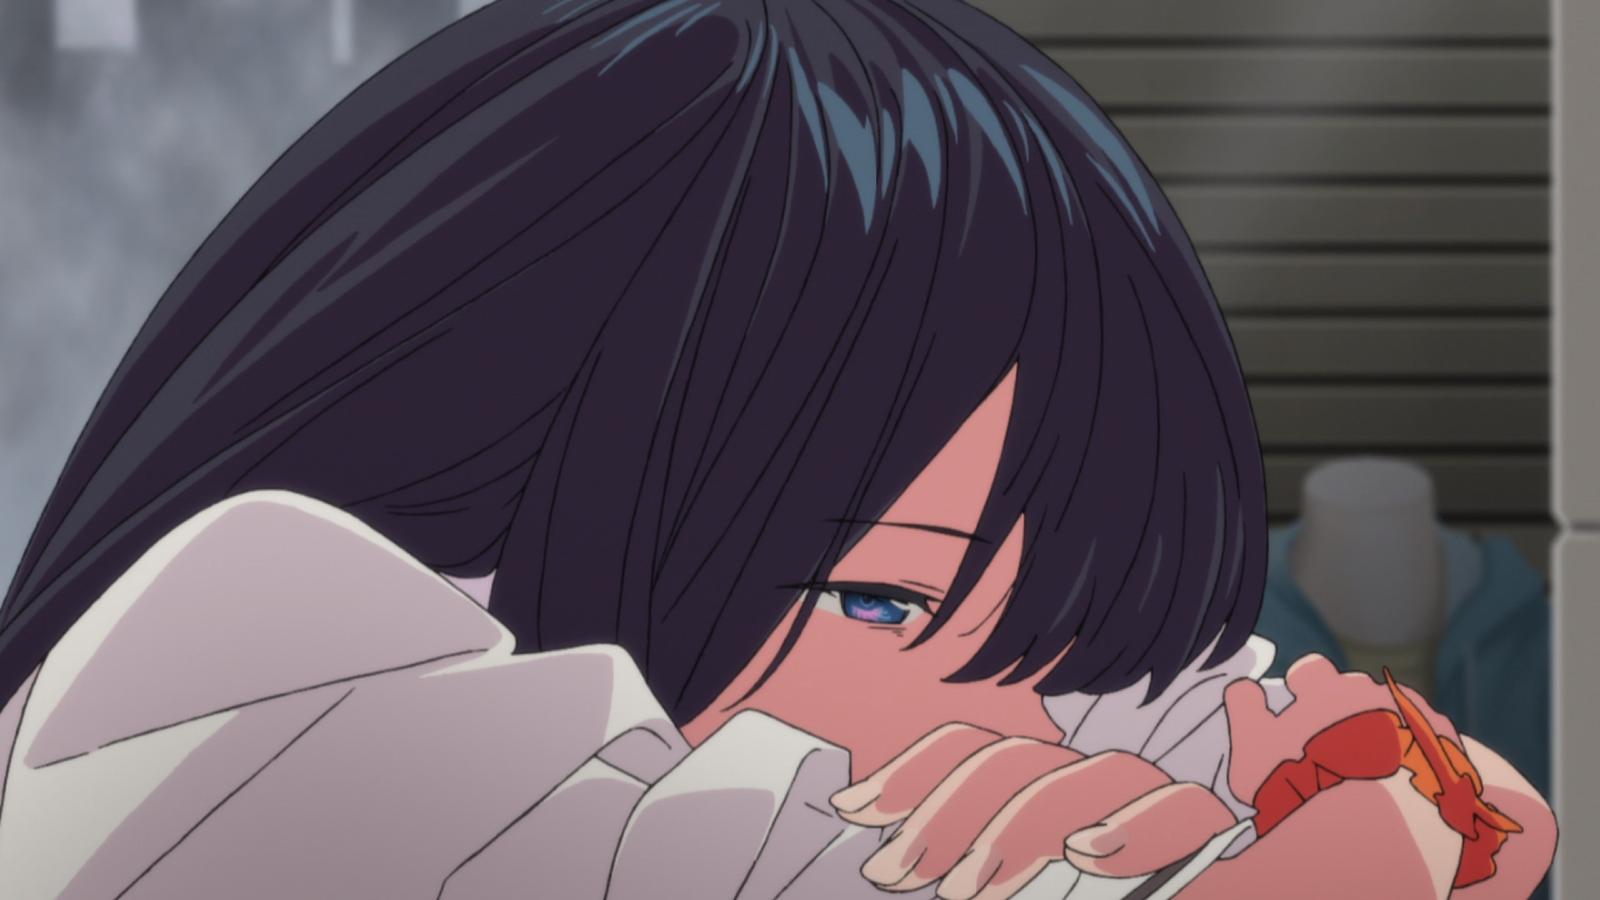 Pin on Anime Screenshots